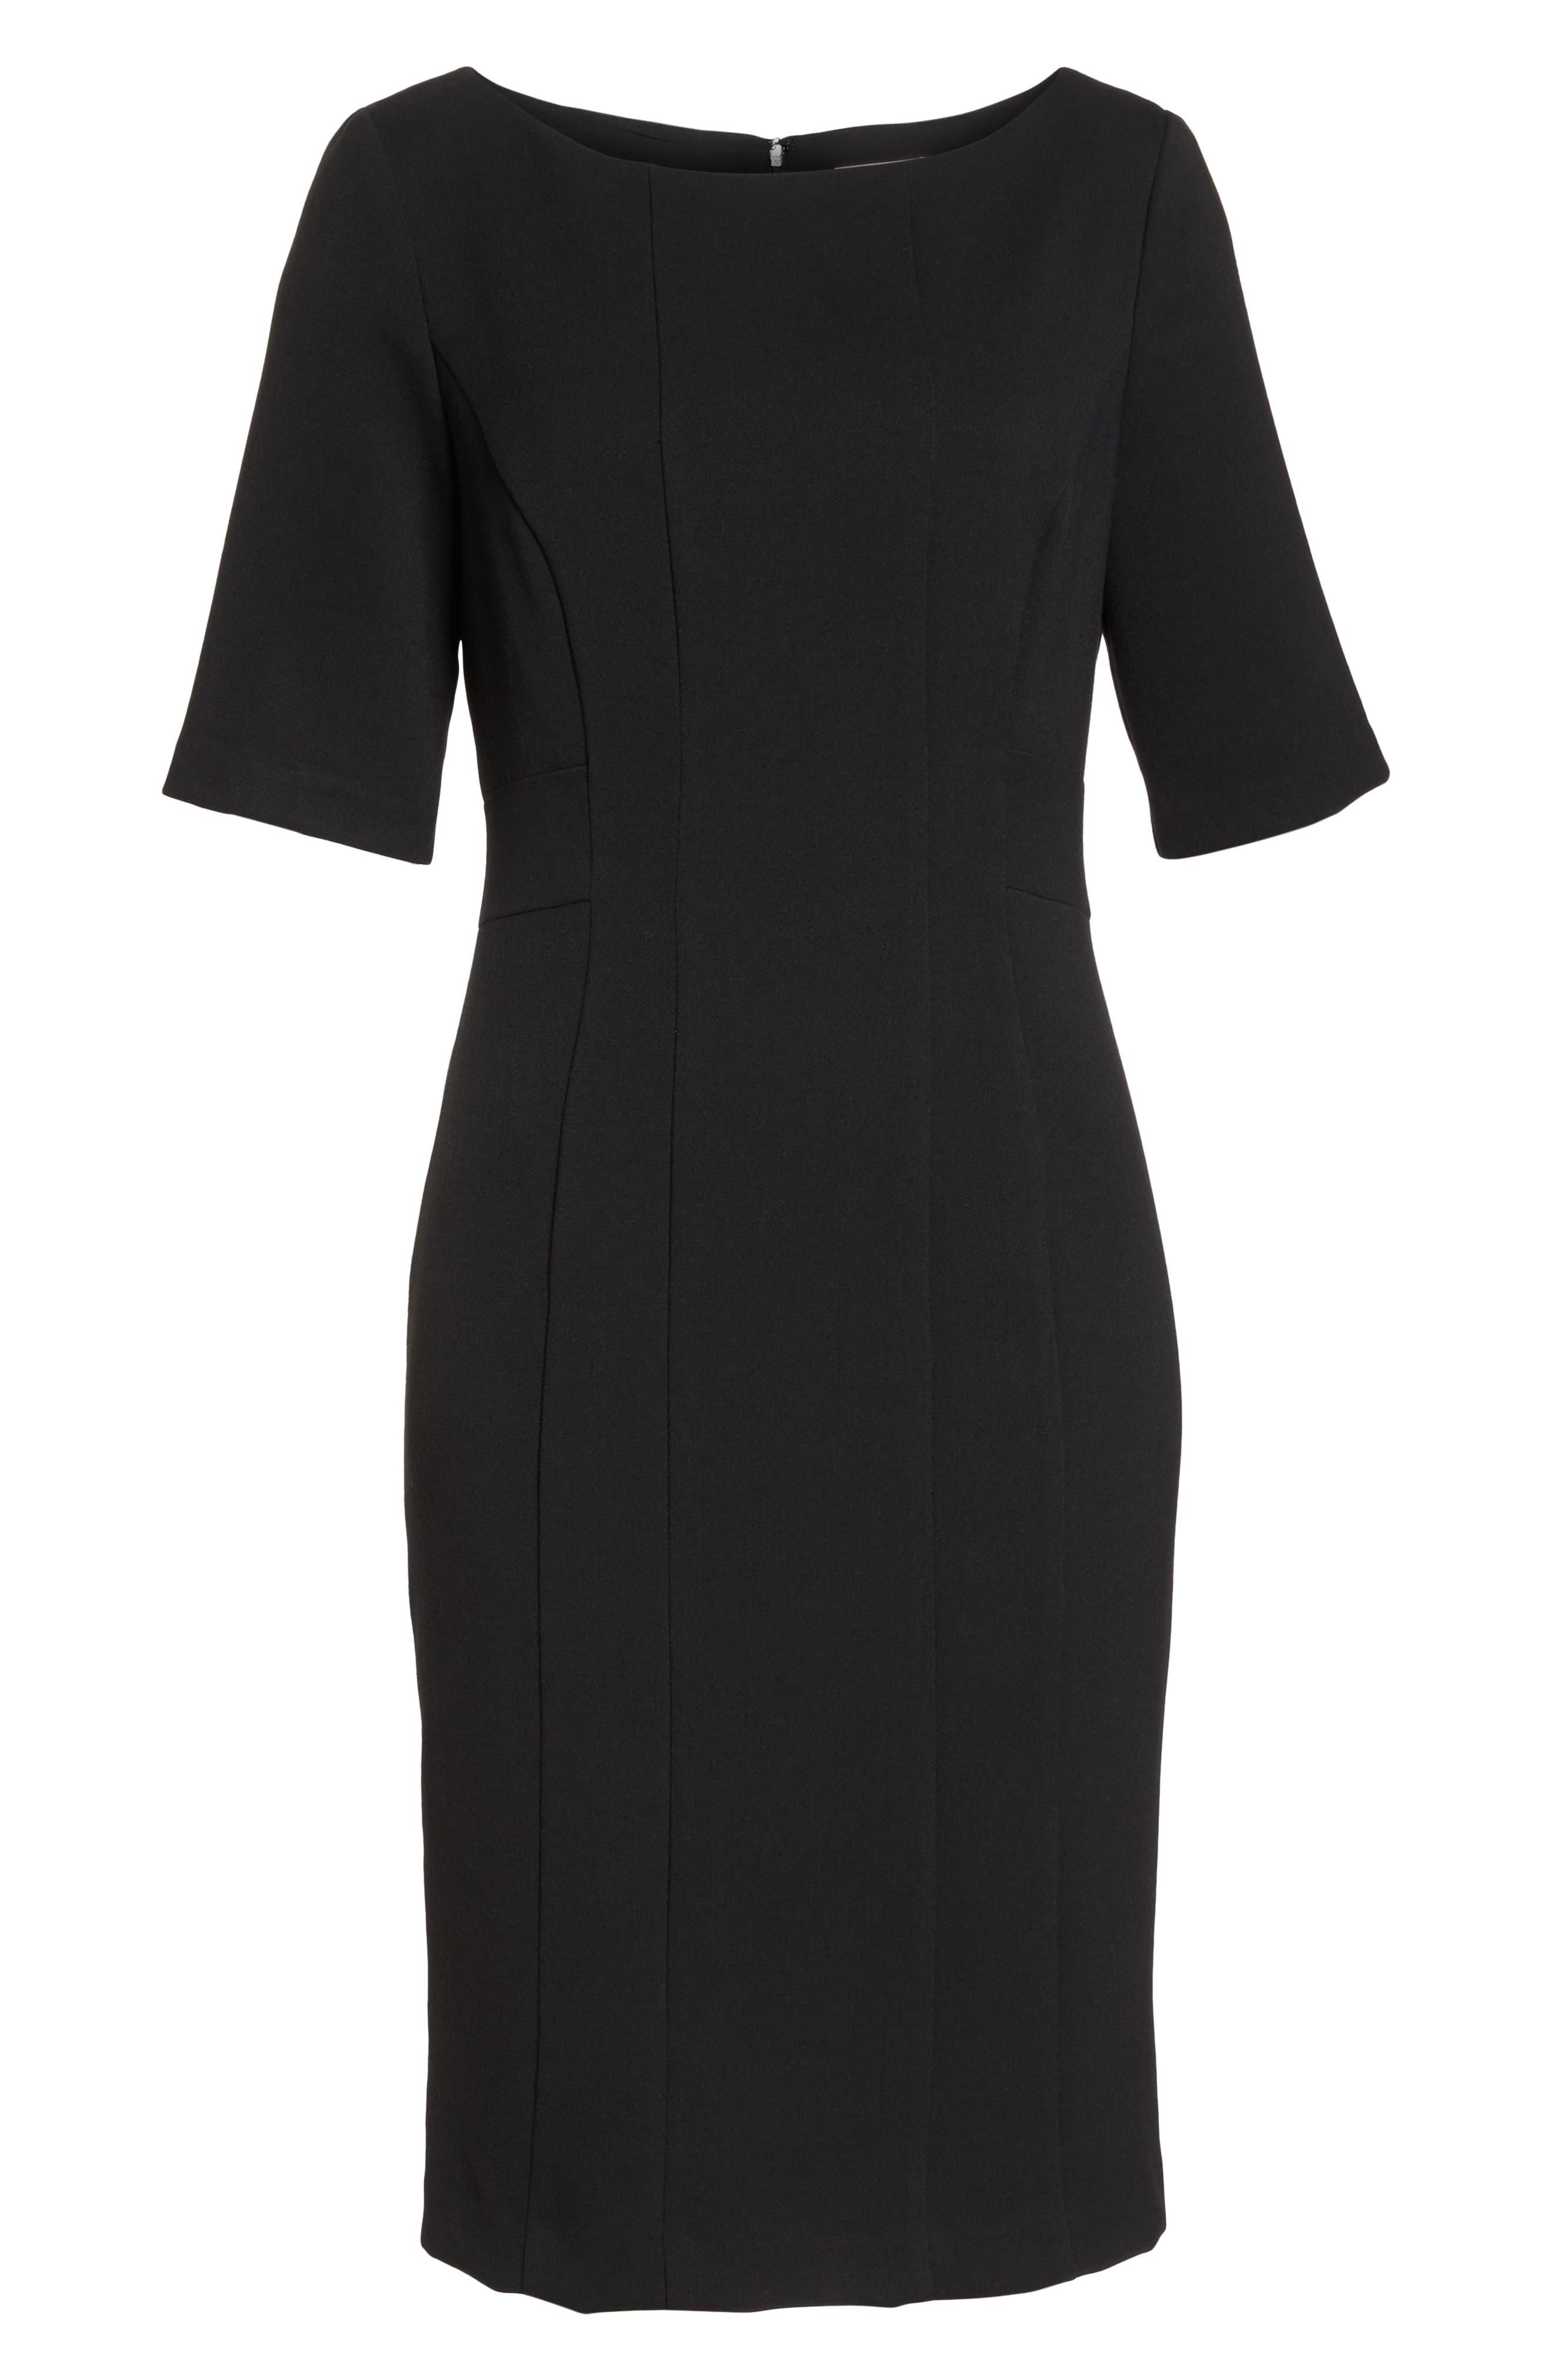 ELIZA J, Bateau Neck Crepe Sheath Dress, Alternate thumbnail 7, color, BLACK